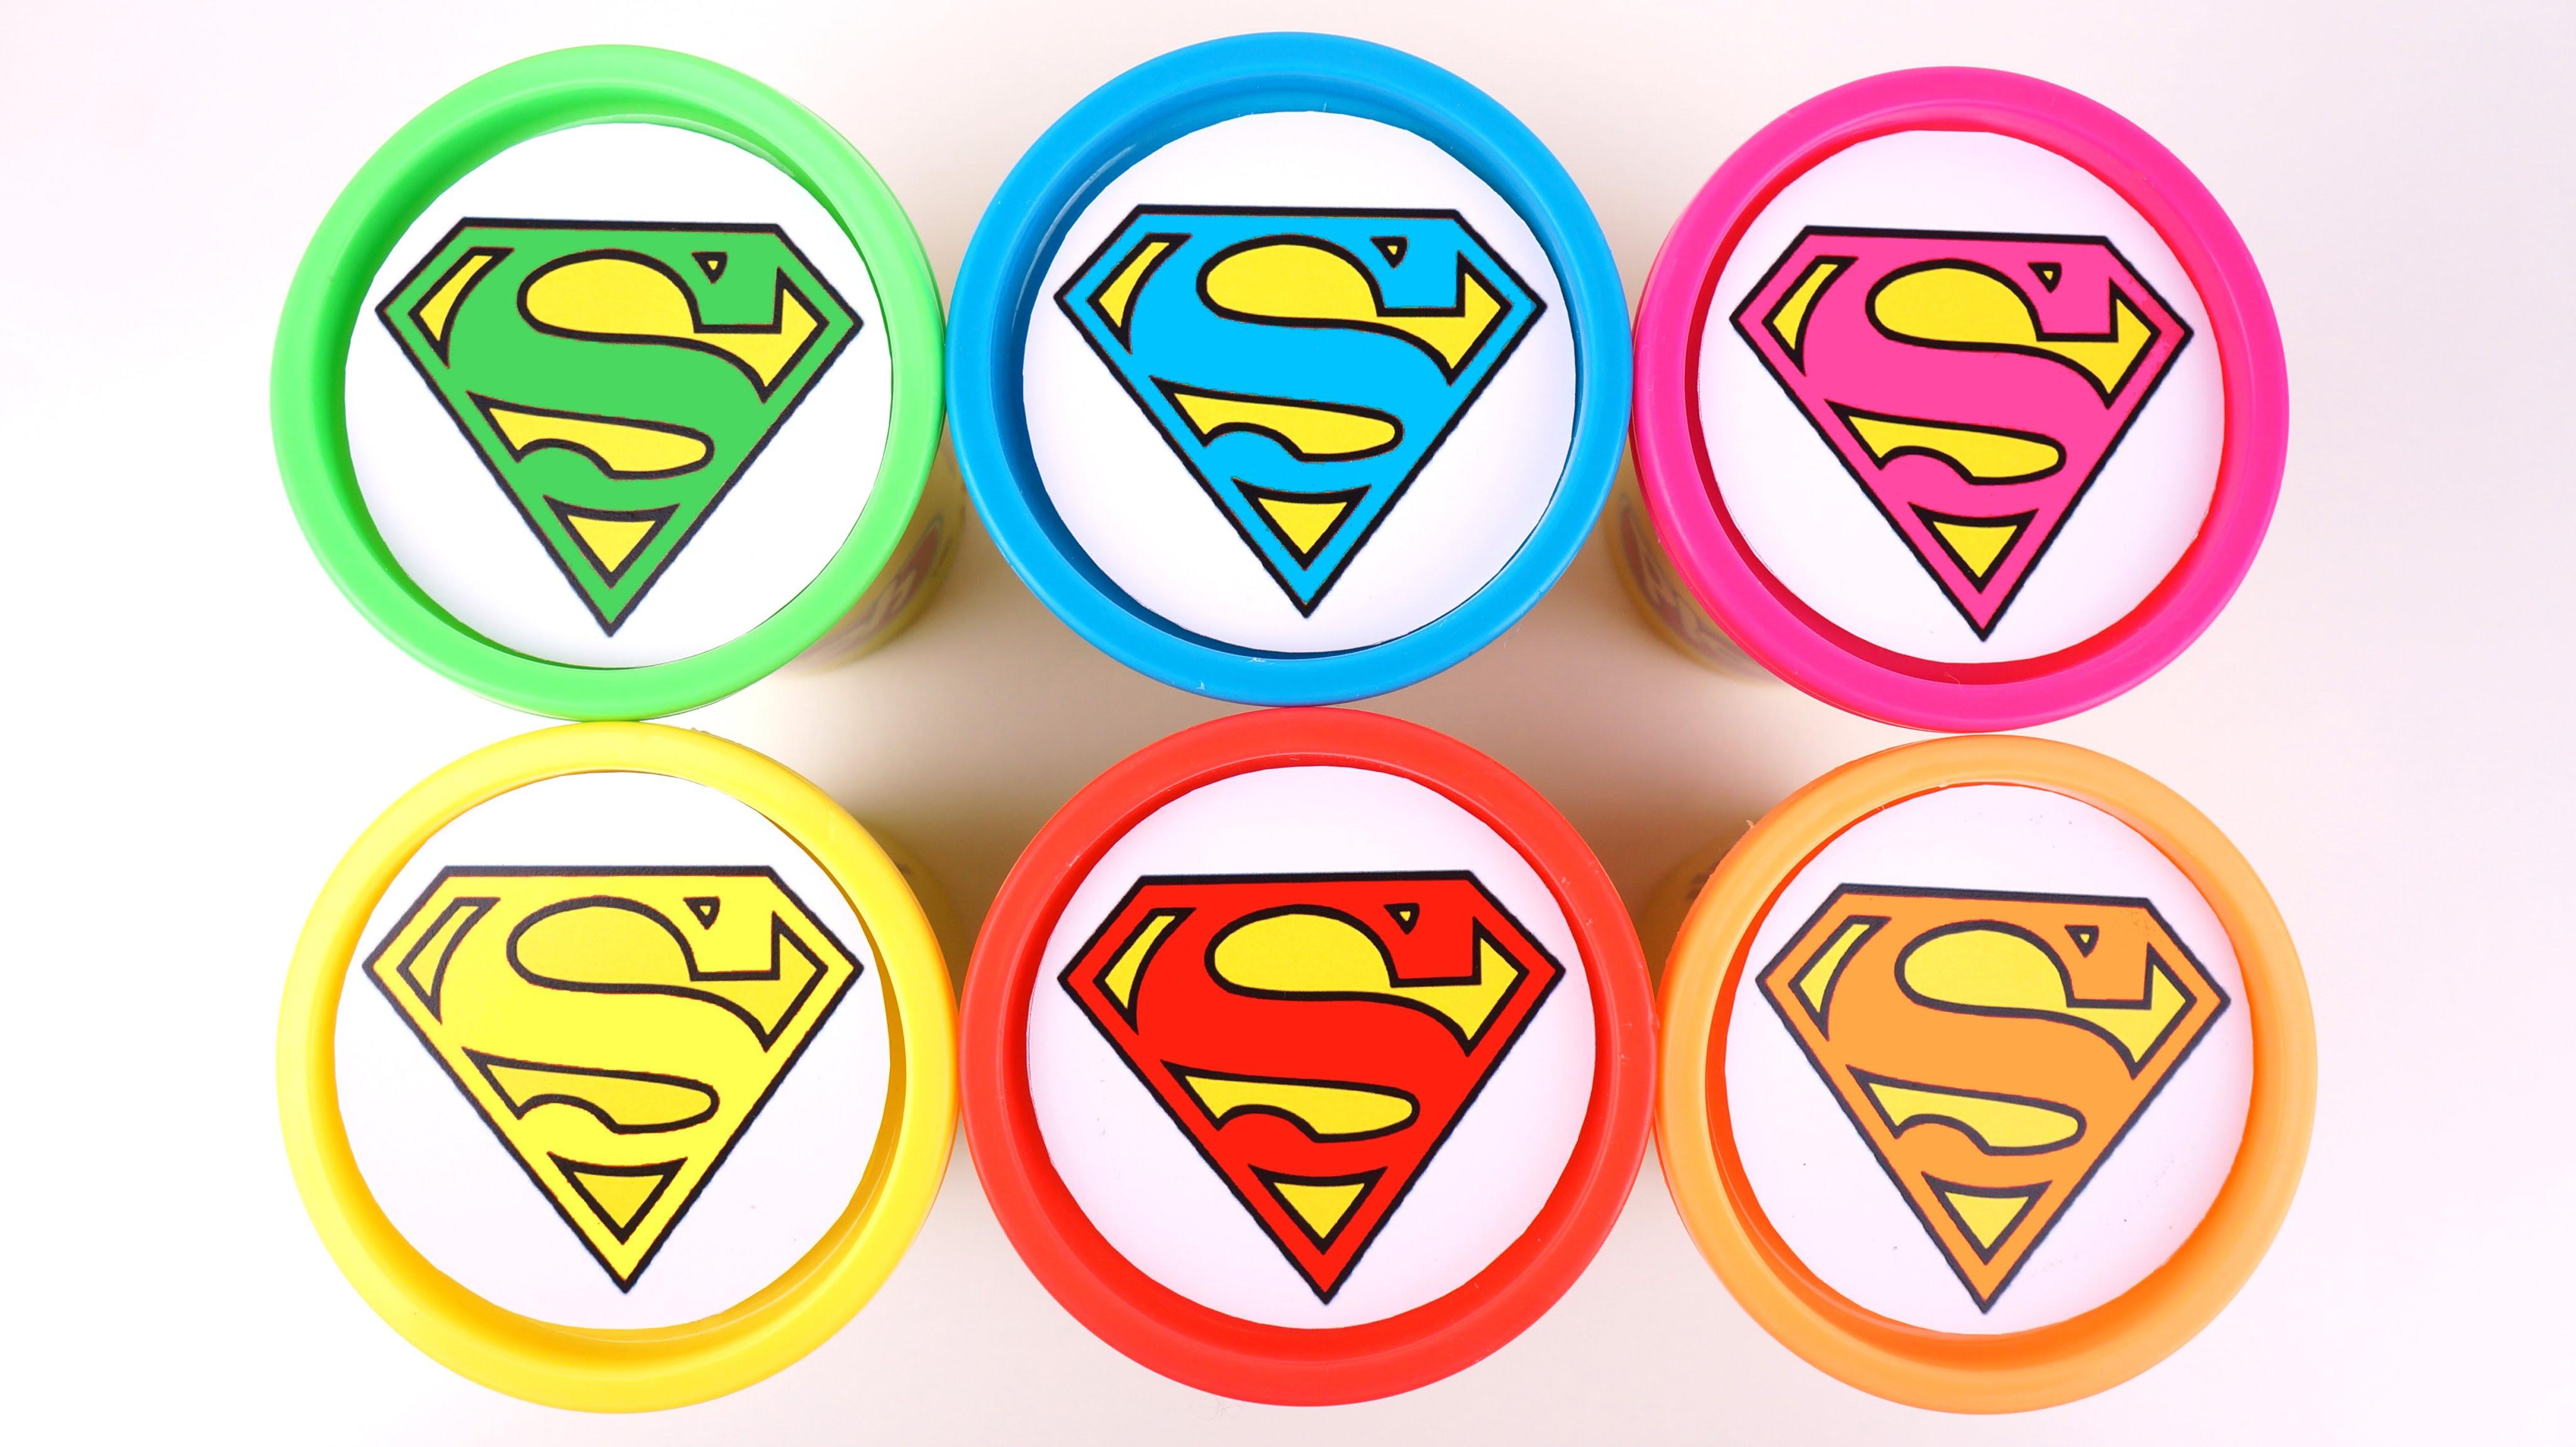 Superman clipart marvel superhero Stacking Collection Superman Clipart Superhero